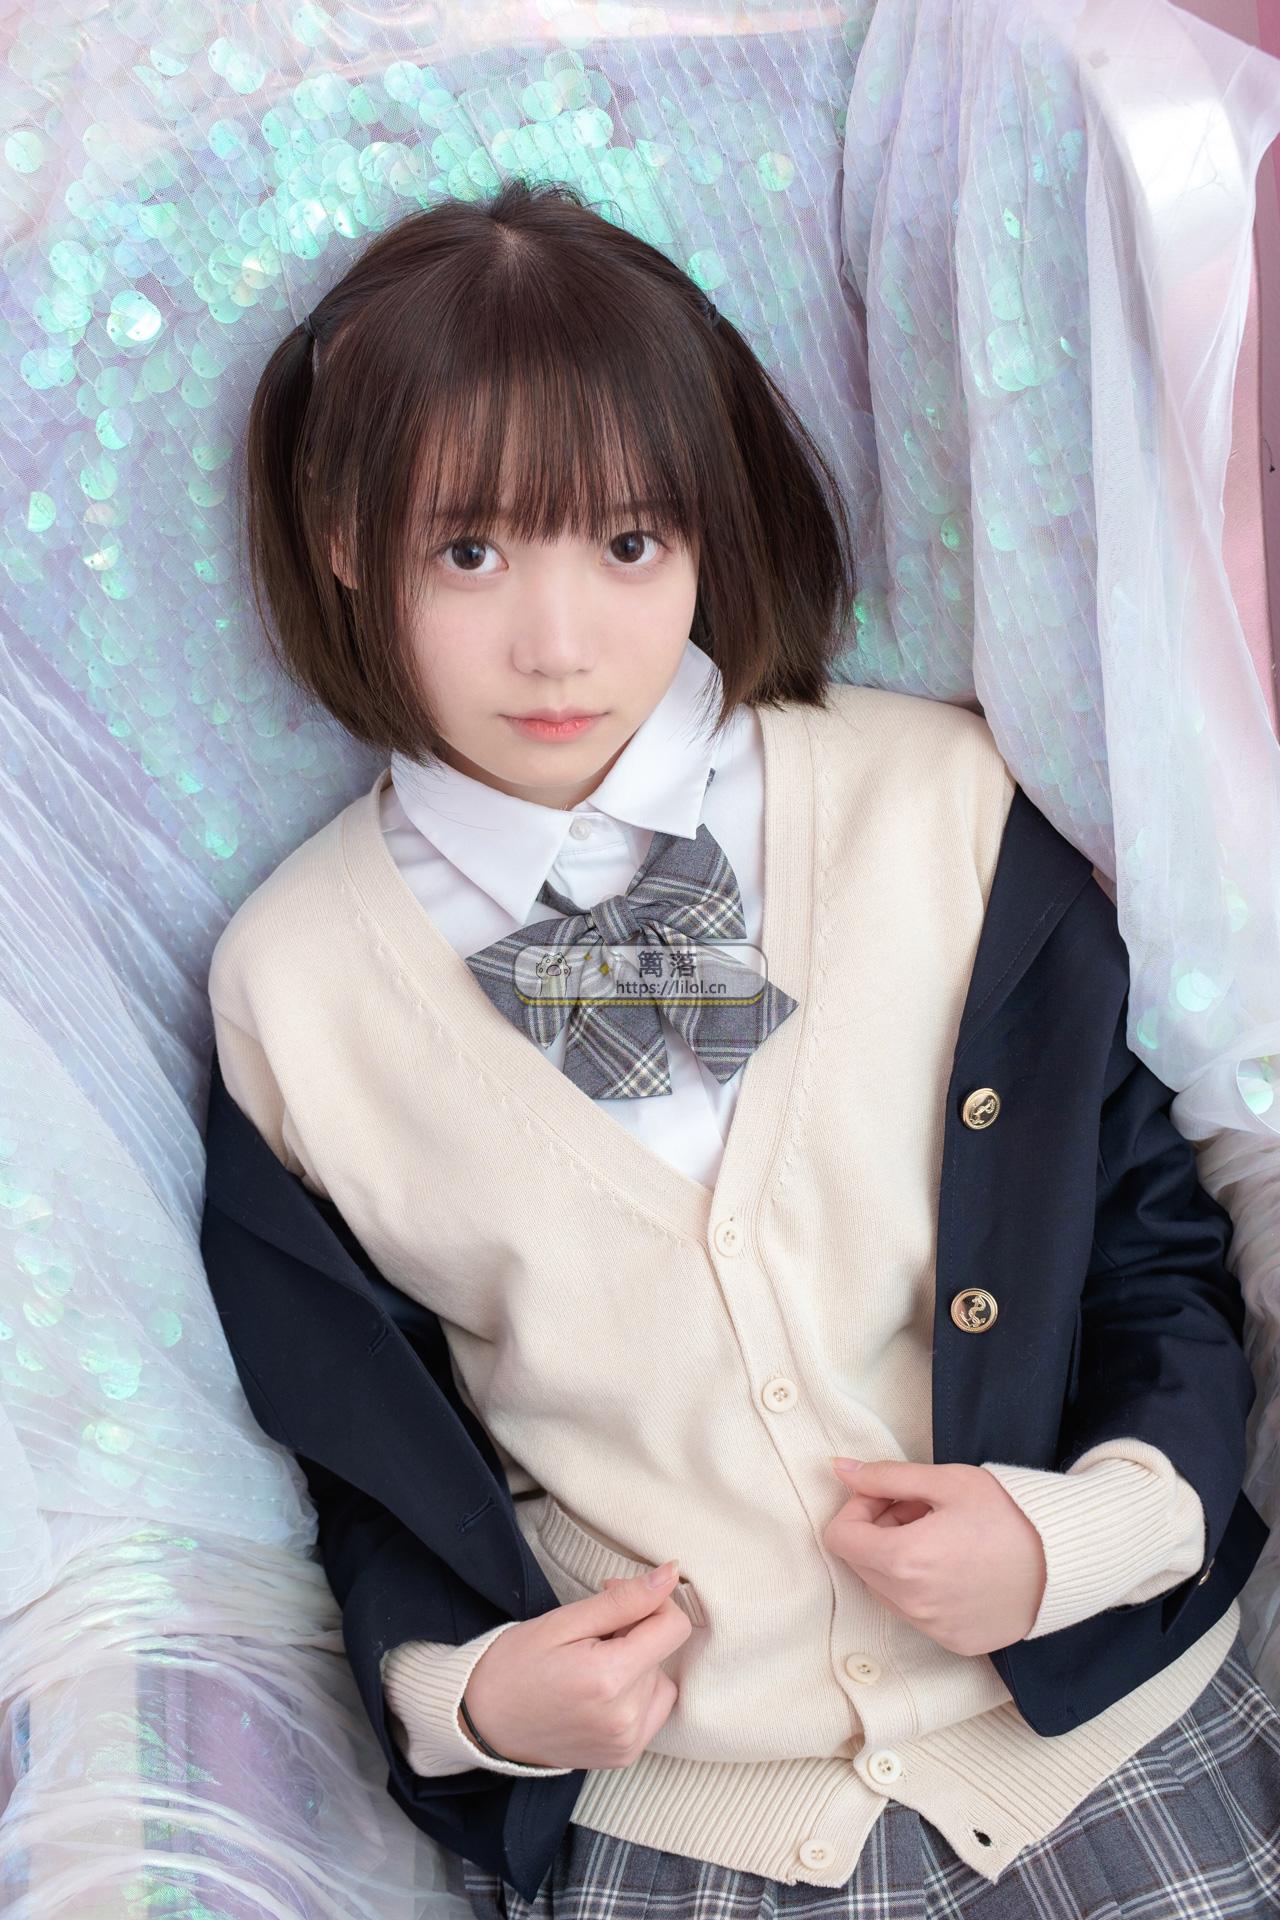 【SSR系列】森萝财团写真 SSR-008 超薄黑丝格子裙美少女闺房写真 [75图-0视频-615MB] SSR系列 第4张